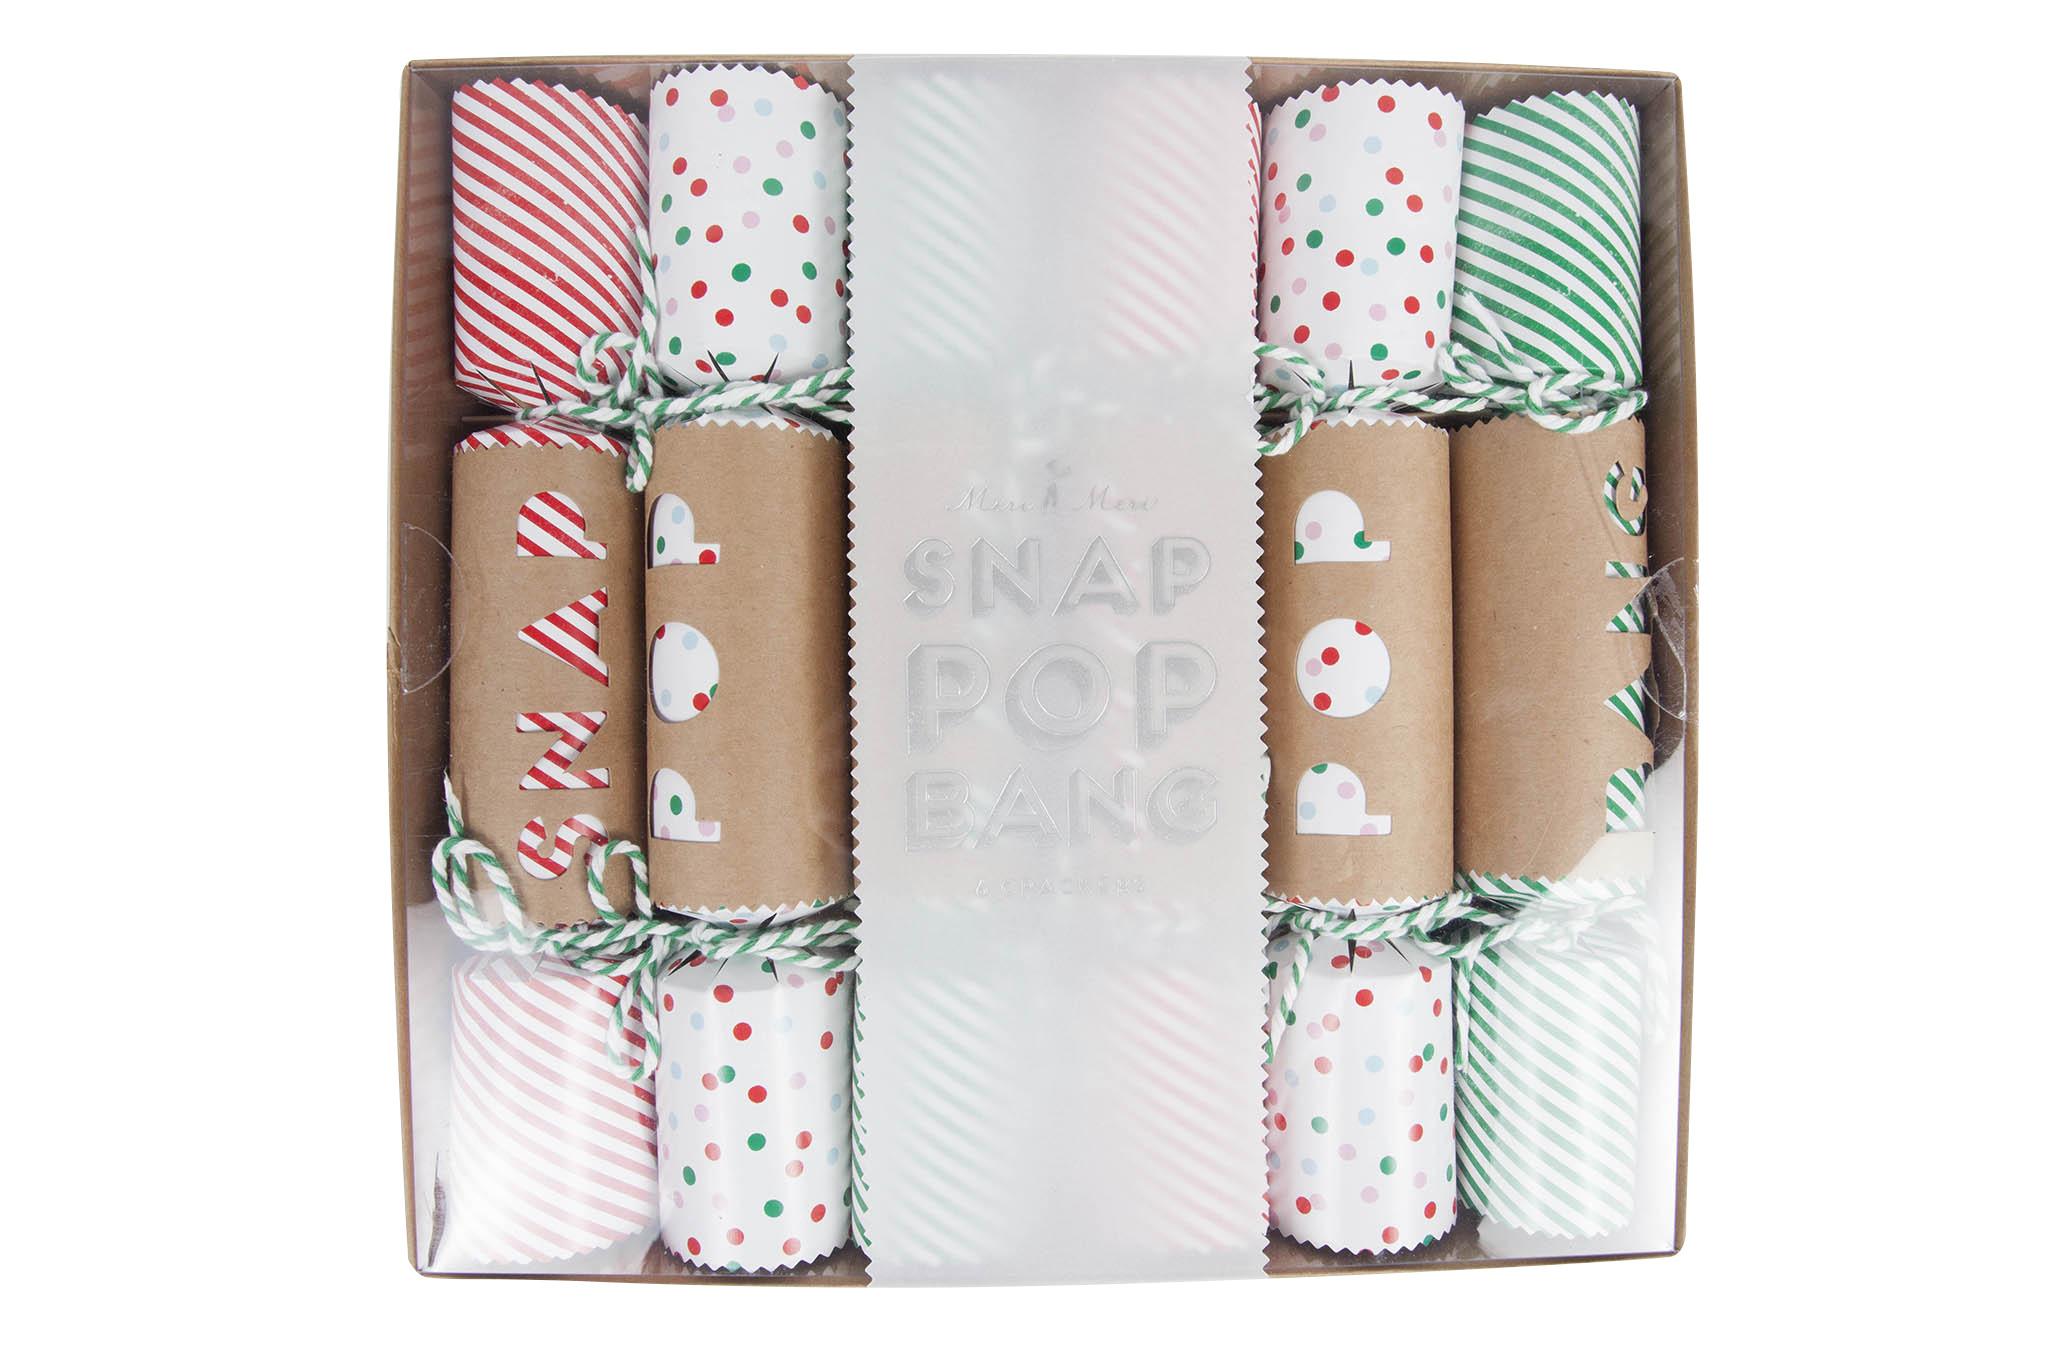 Stylish Christmas crackers